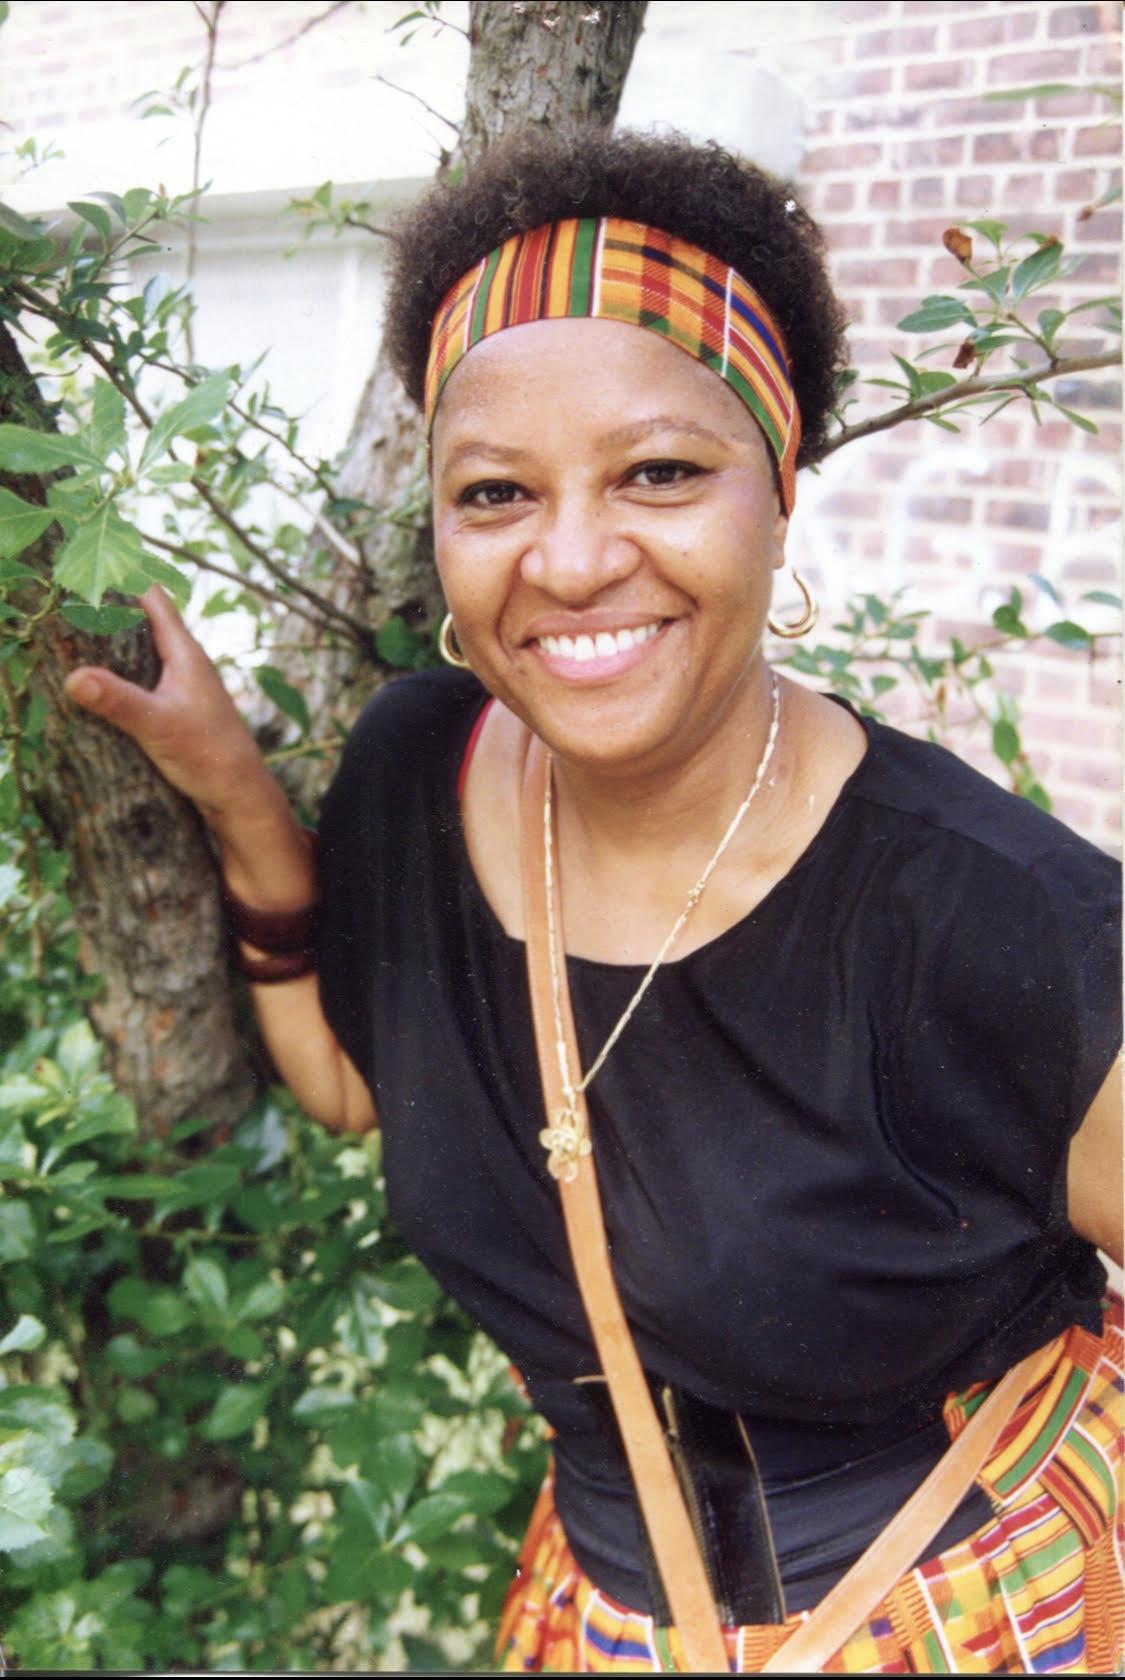 Ruth Edwards smiling warmly at you